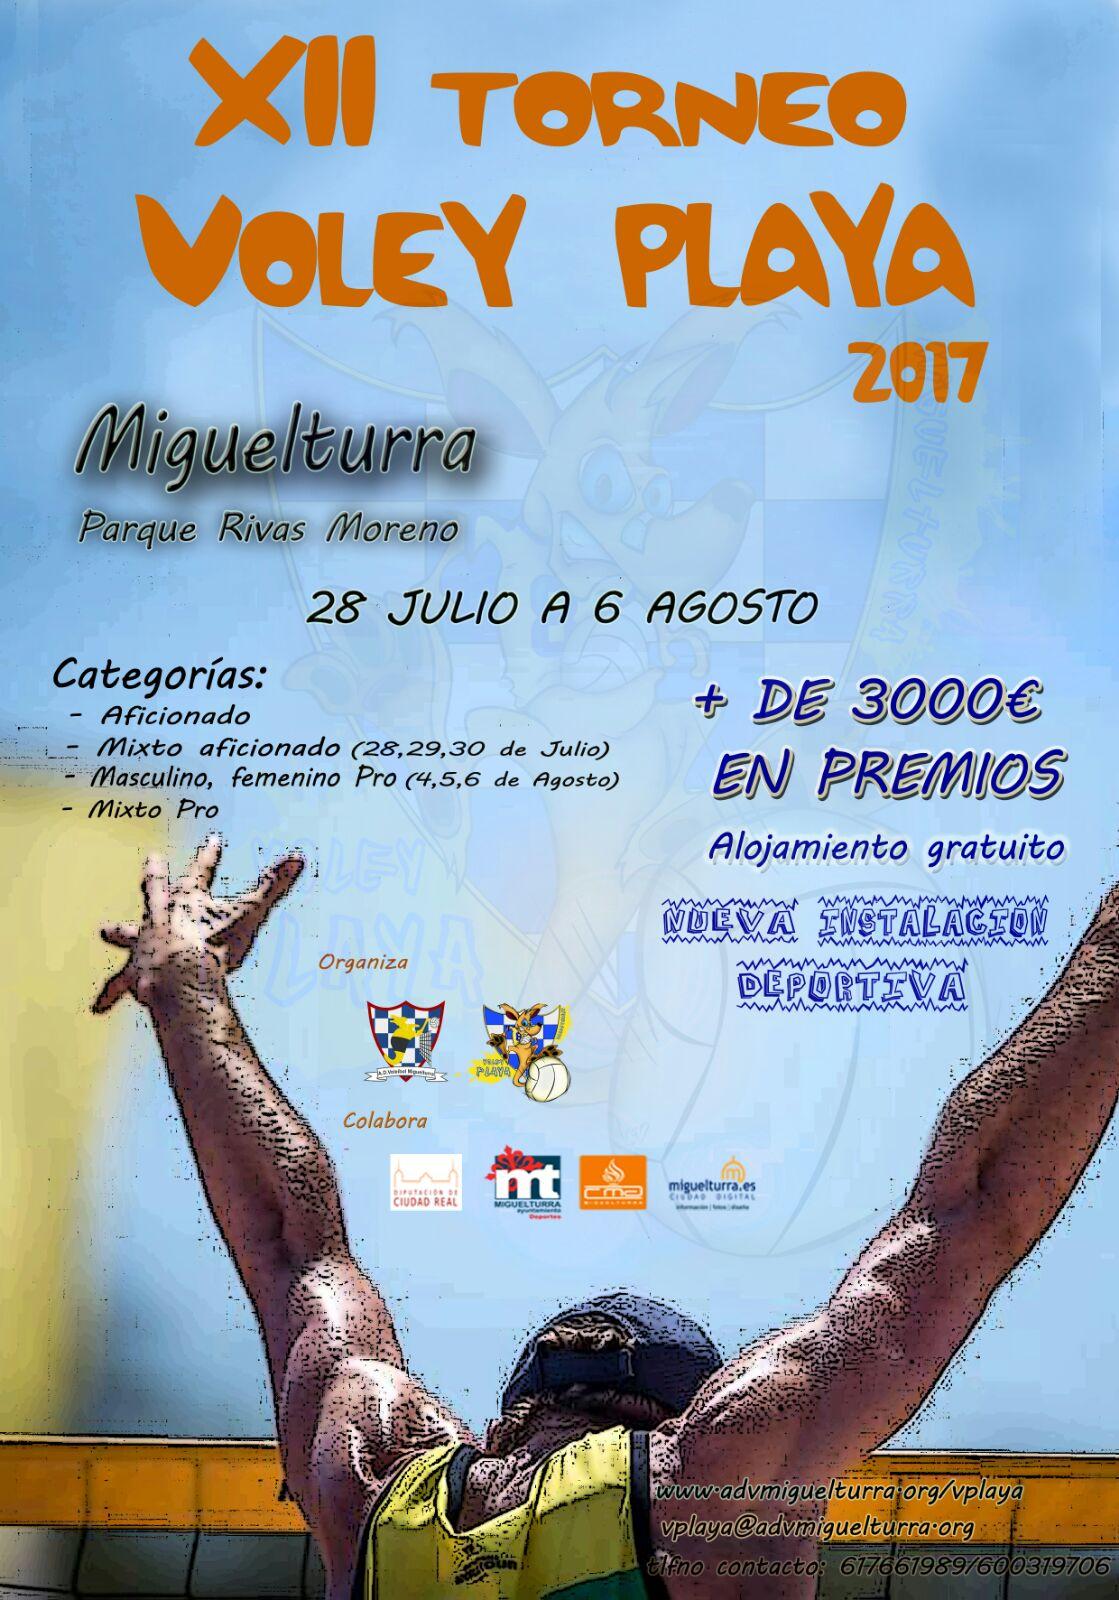 XII Torneo Miguelturra de Voley-Playa